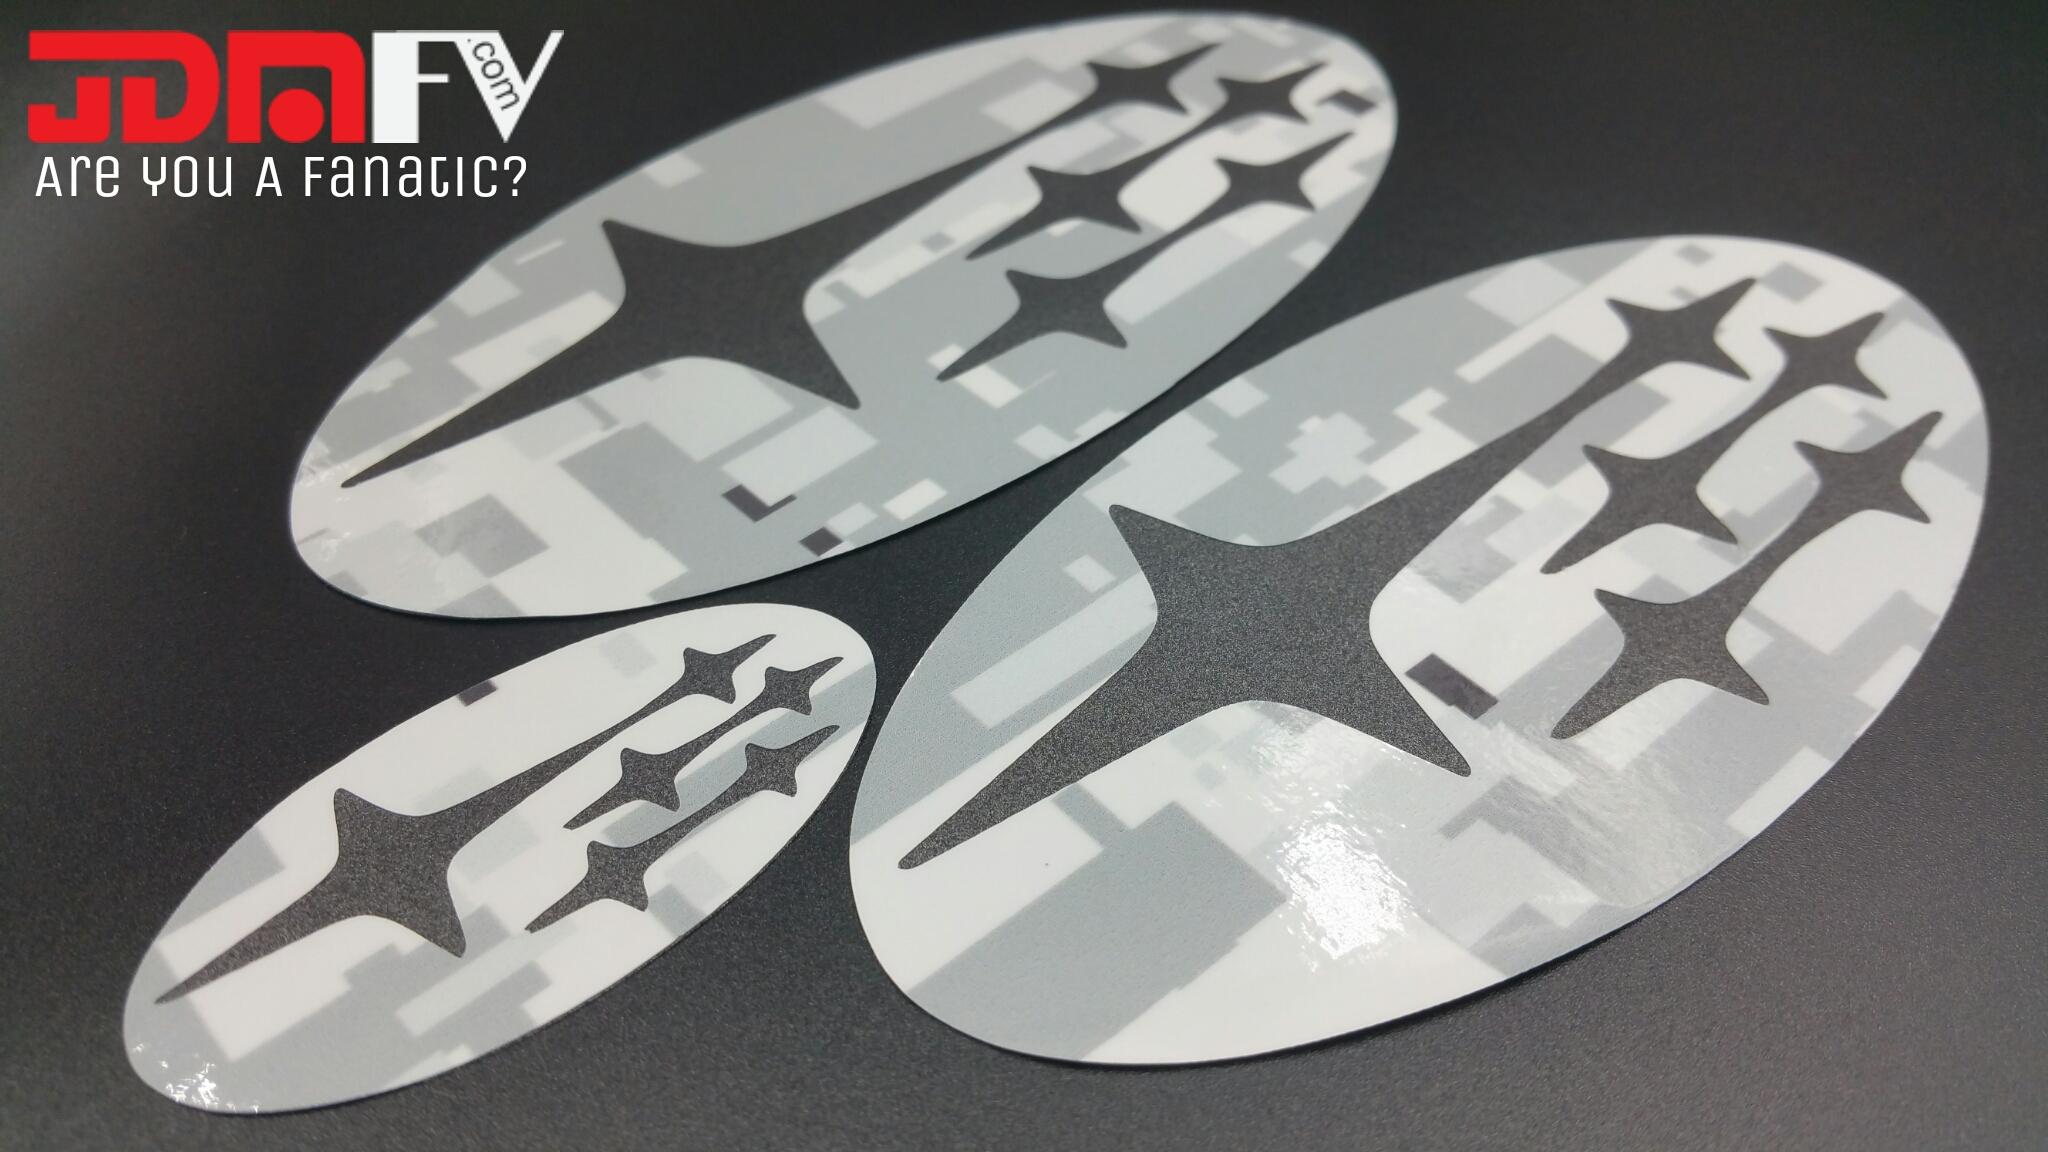 snow-camo-subaru-emblem-overlays-gray-jdmfv.jpg